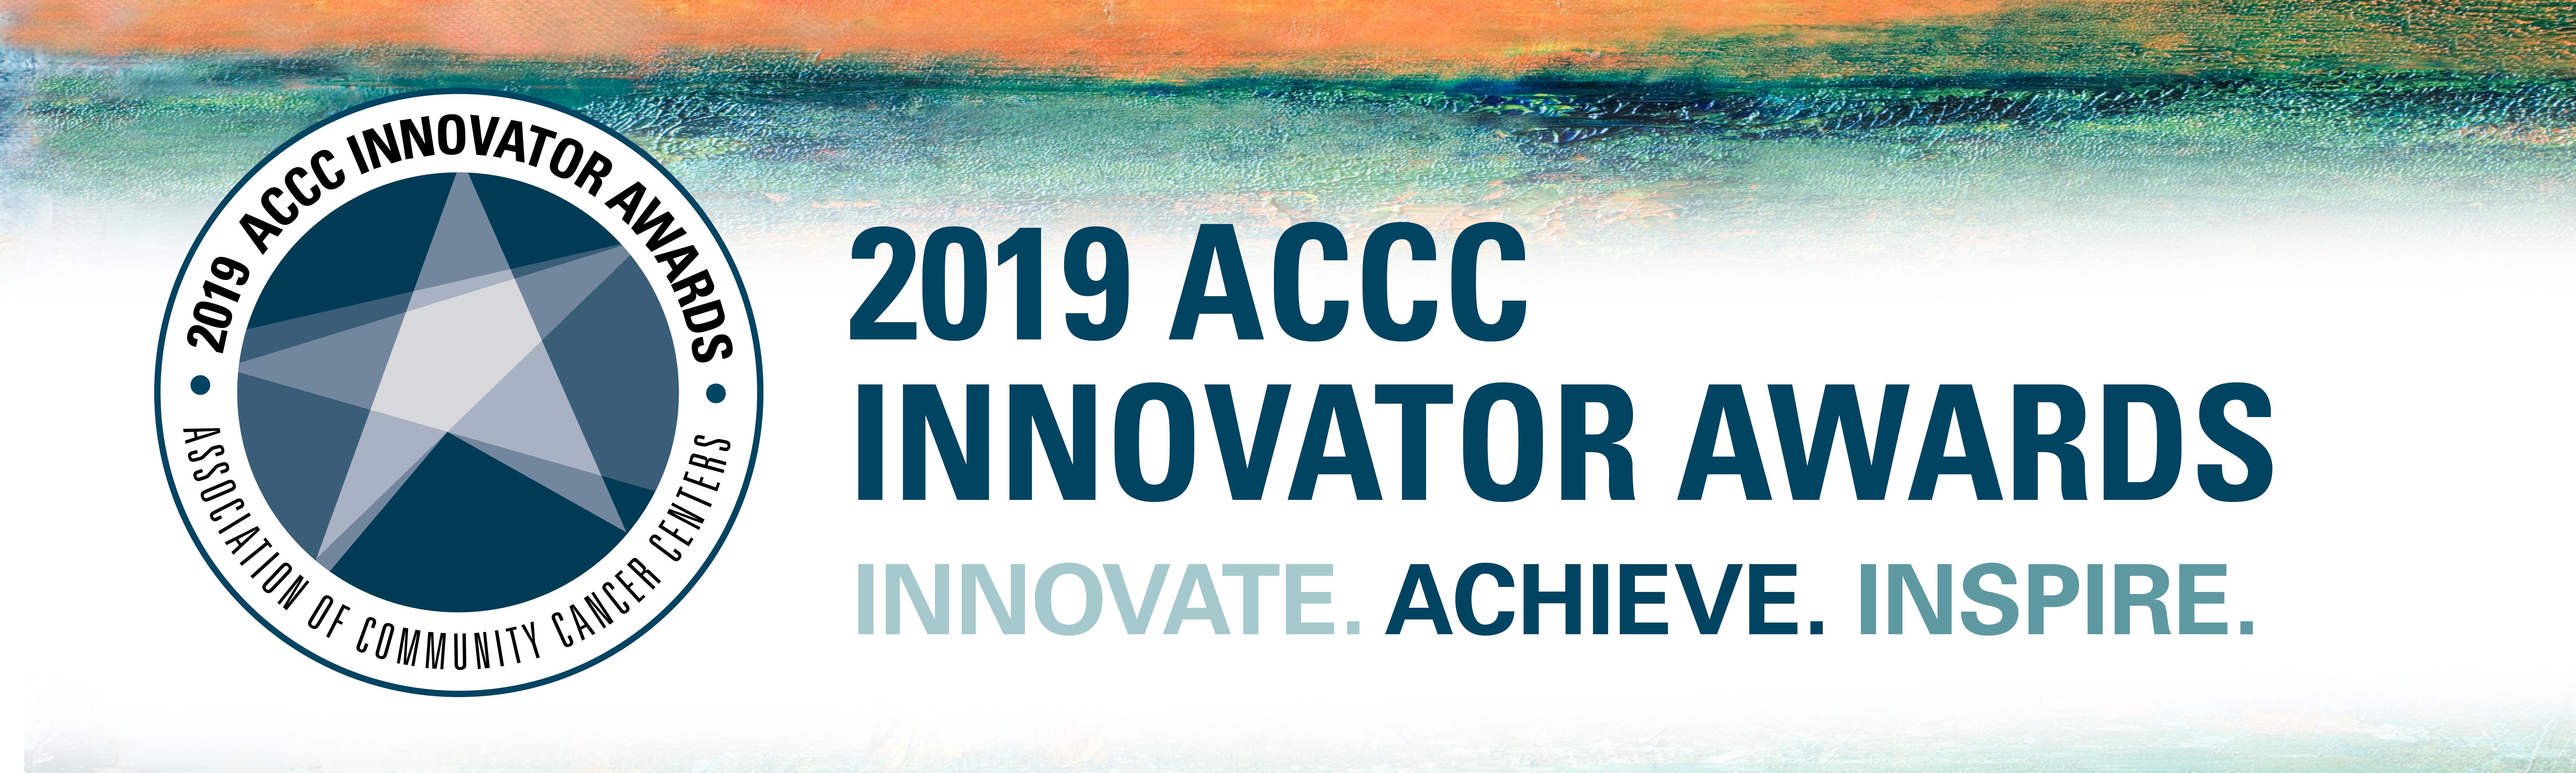 ACCC Innovator Awards